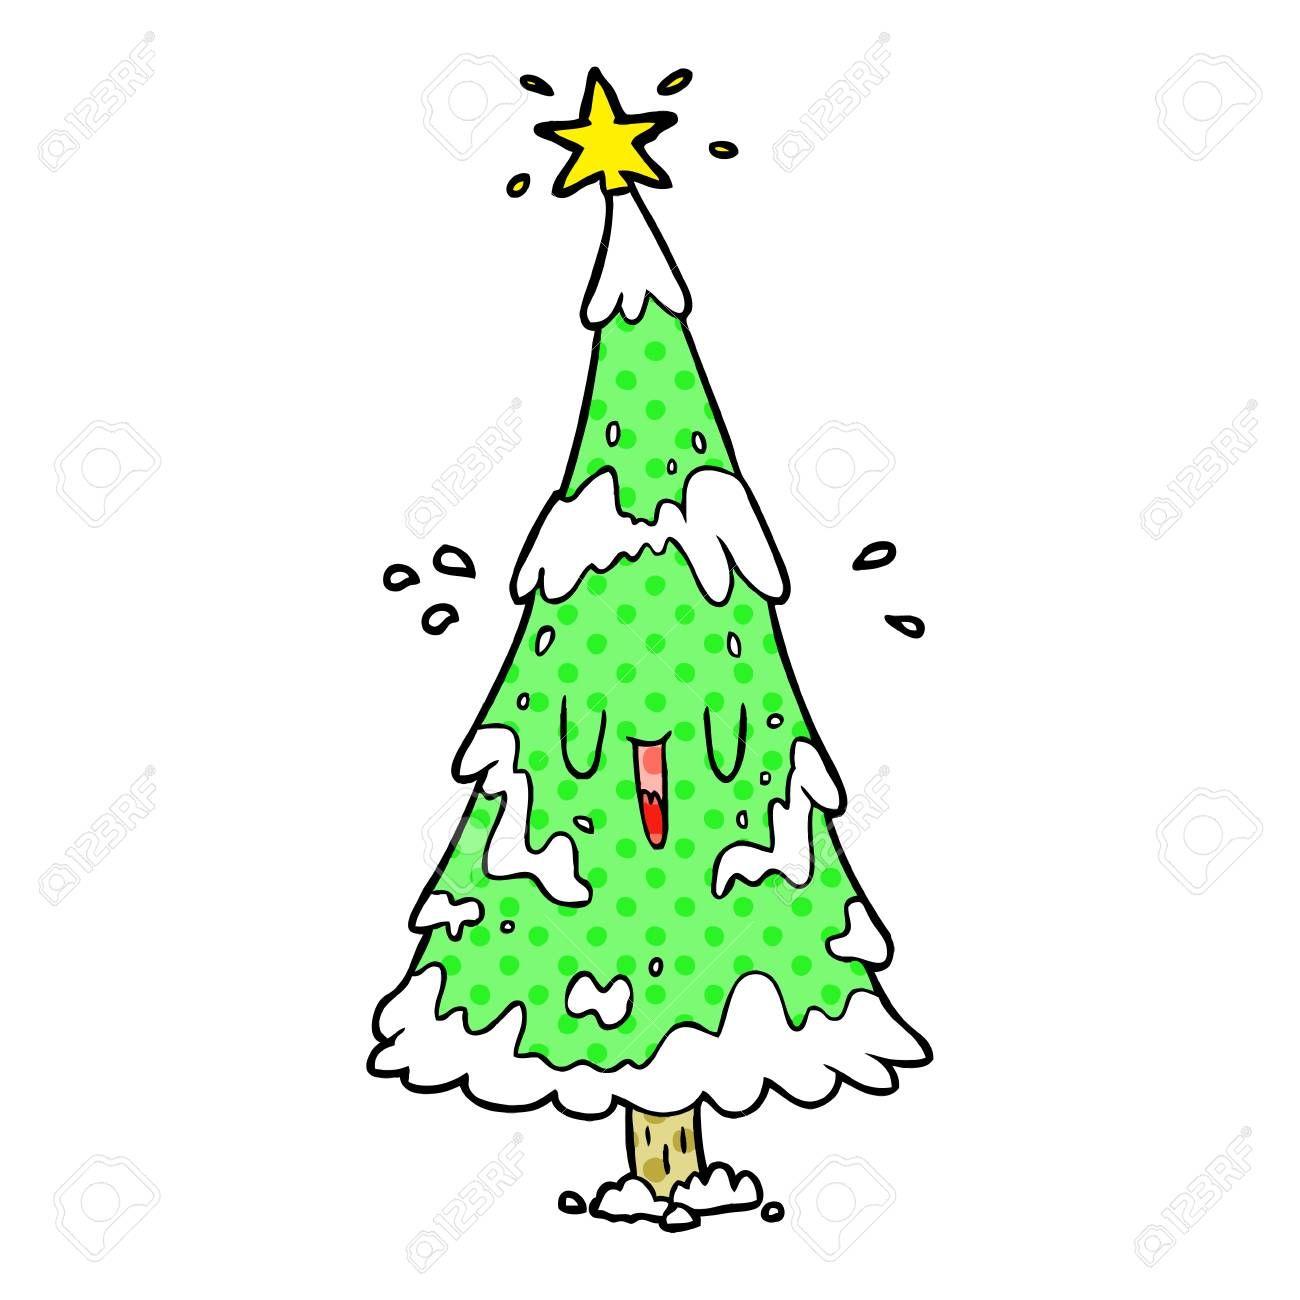 Cartoon Snowy Christmas Tree With Happy Face Sponsored Christmas Snowy Cartoon Face Happy